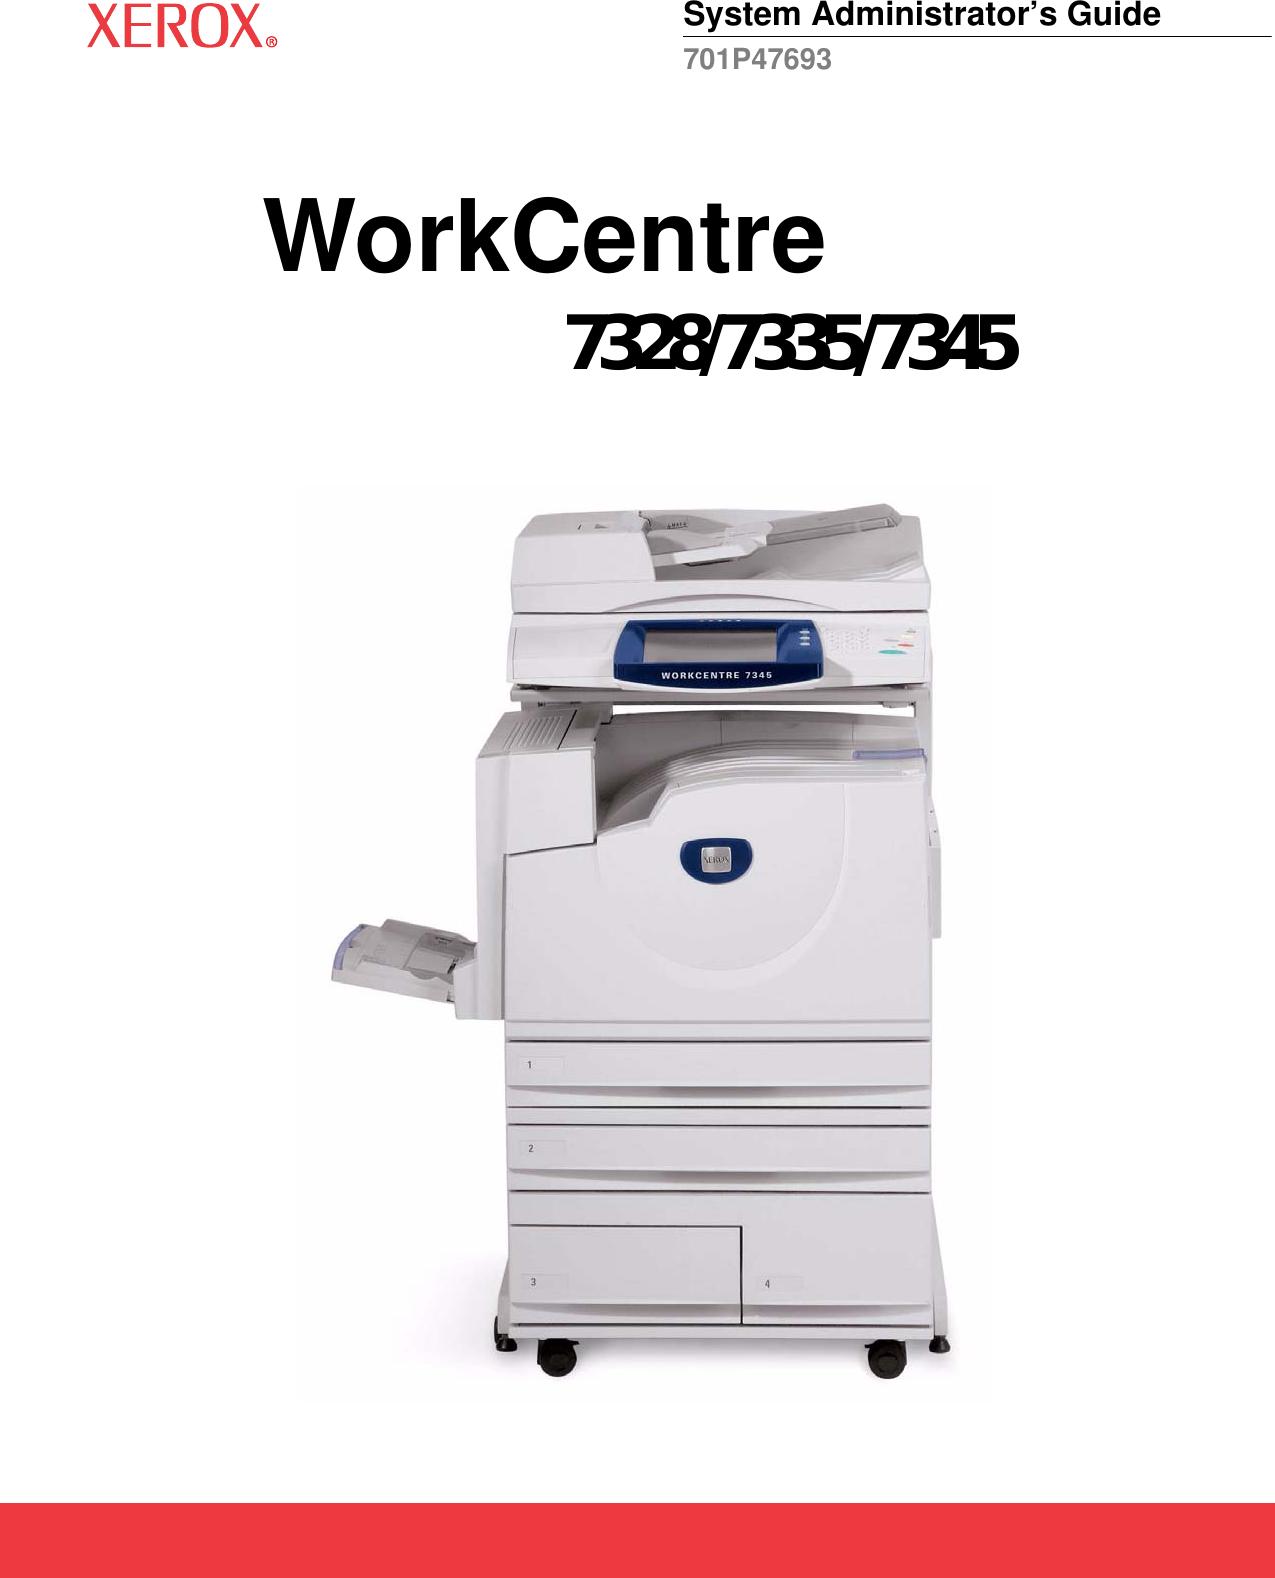 xerox workcentre 7345 error code manual